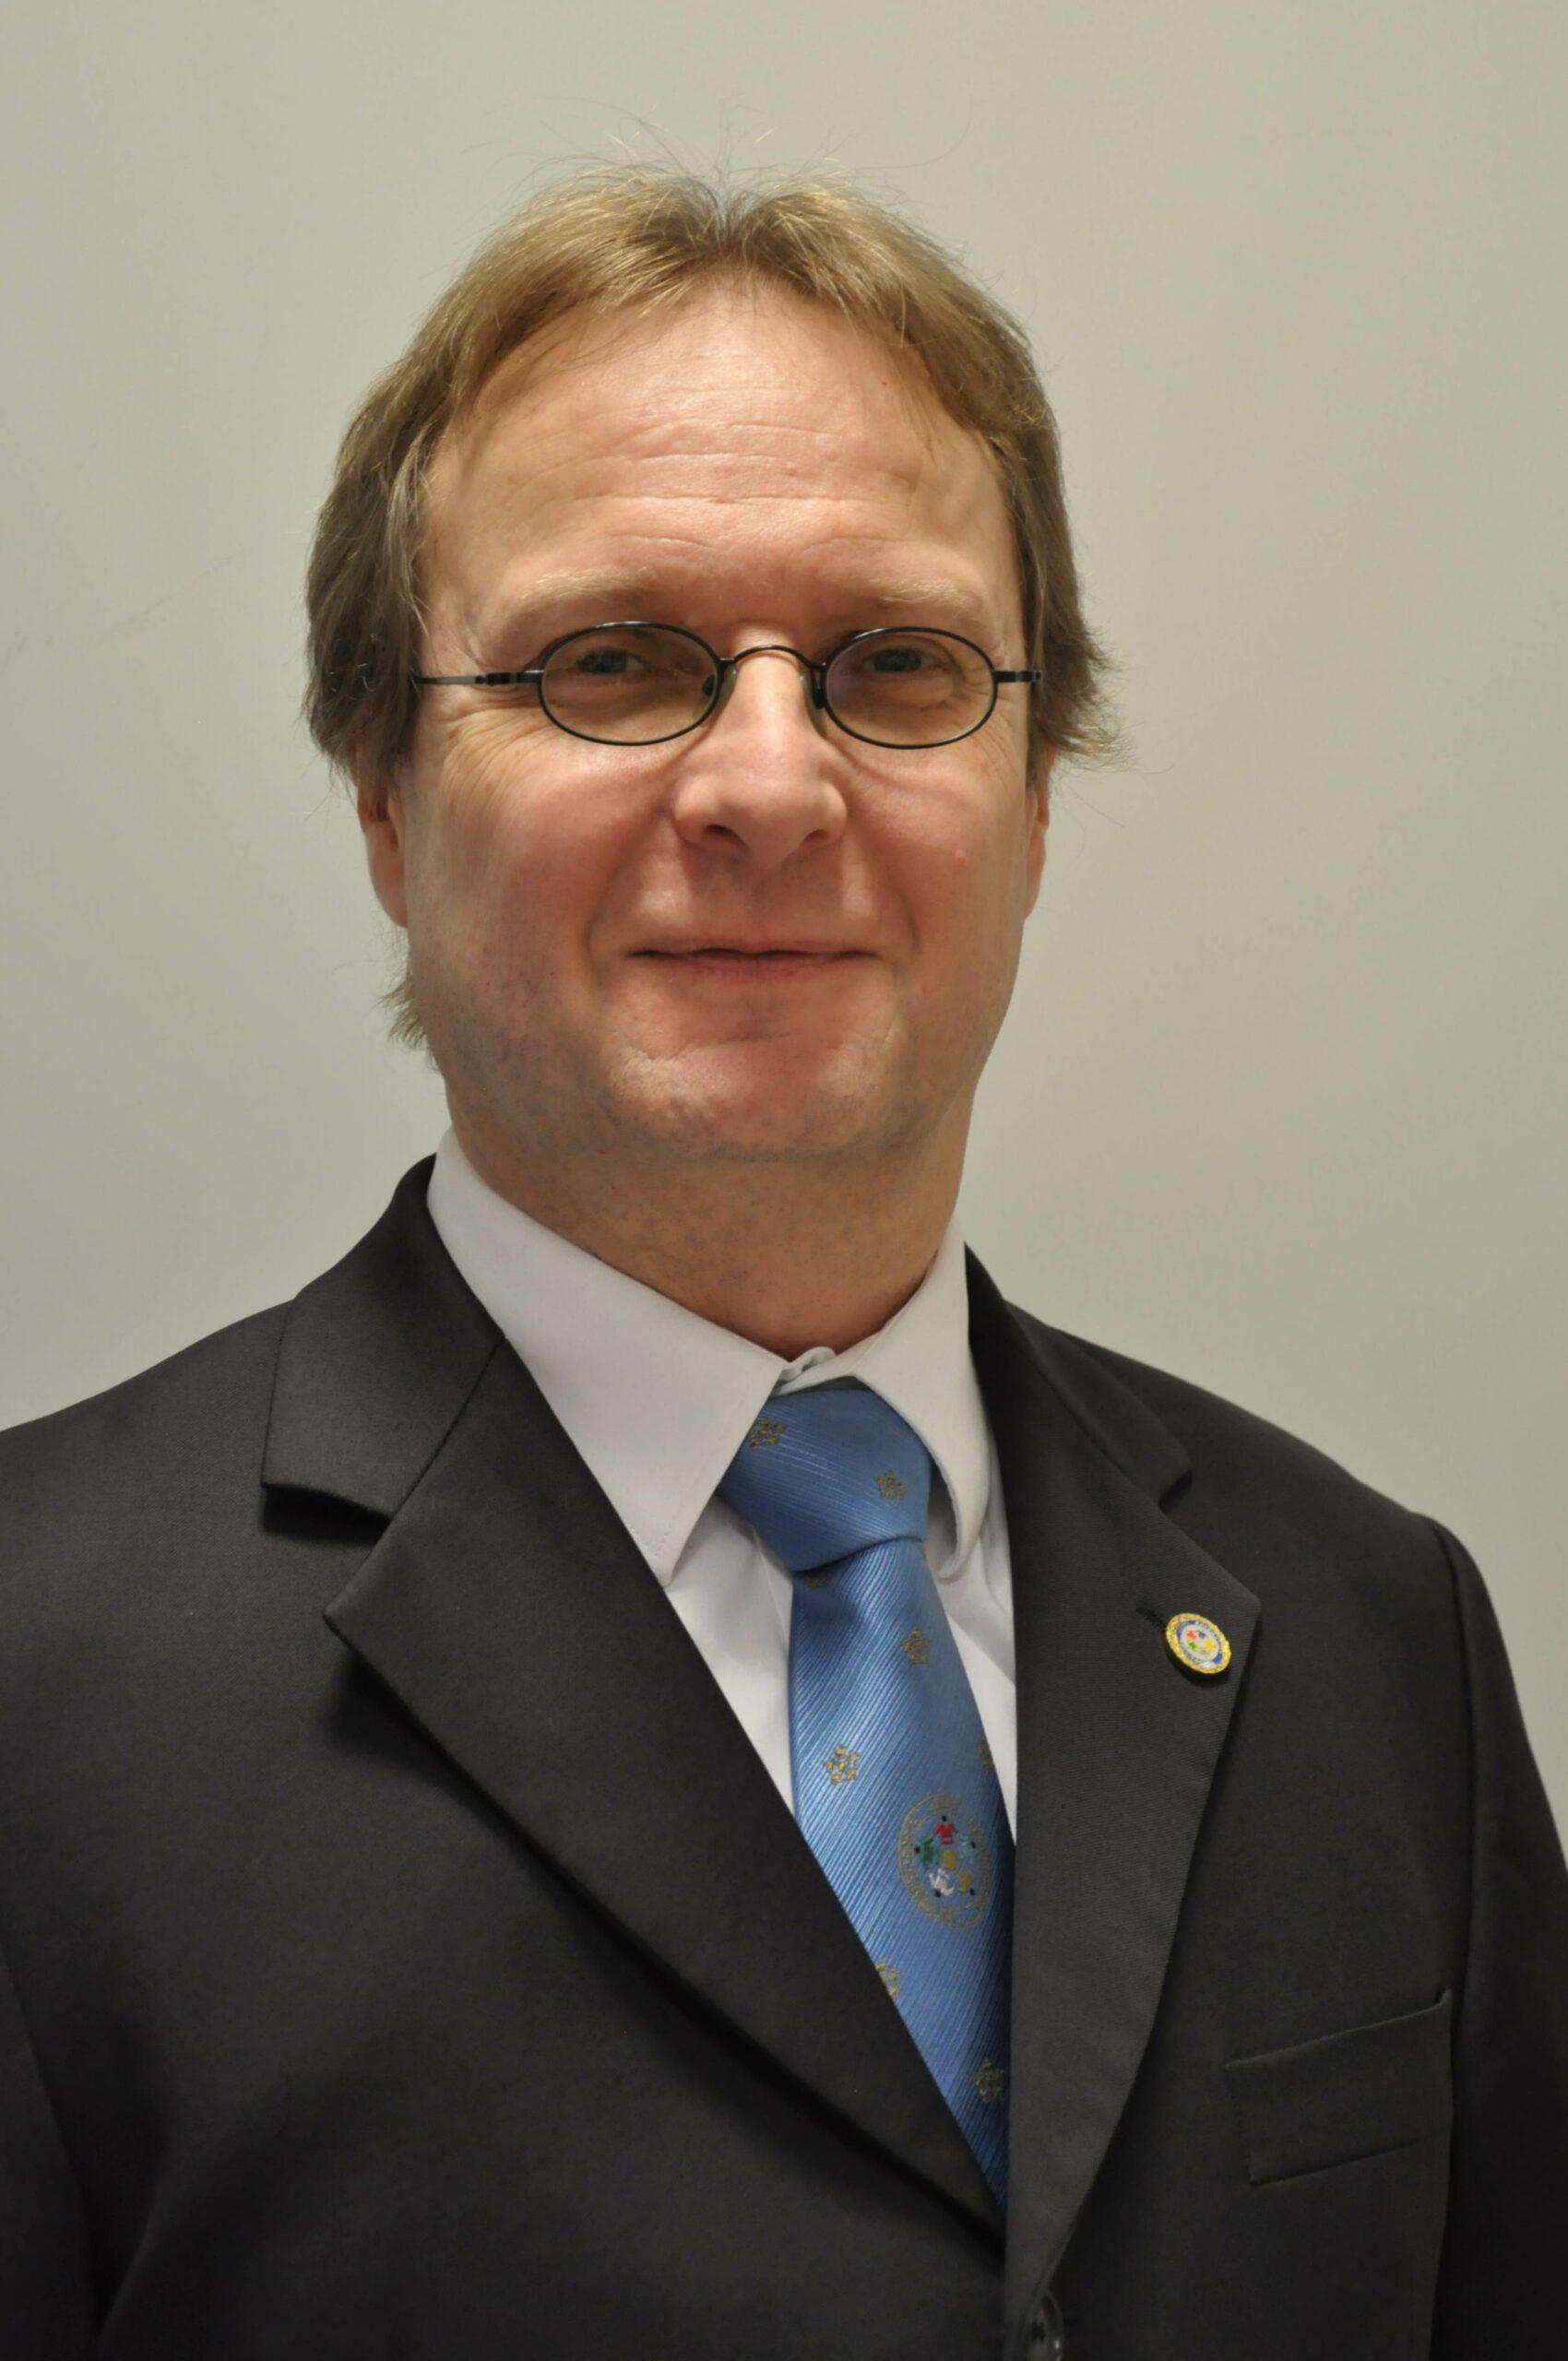 Mr. Stefan Bernreuther